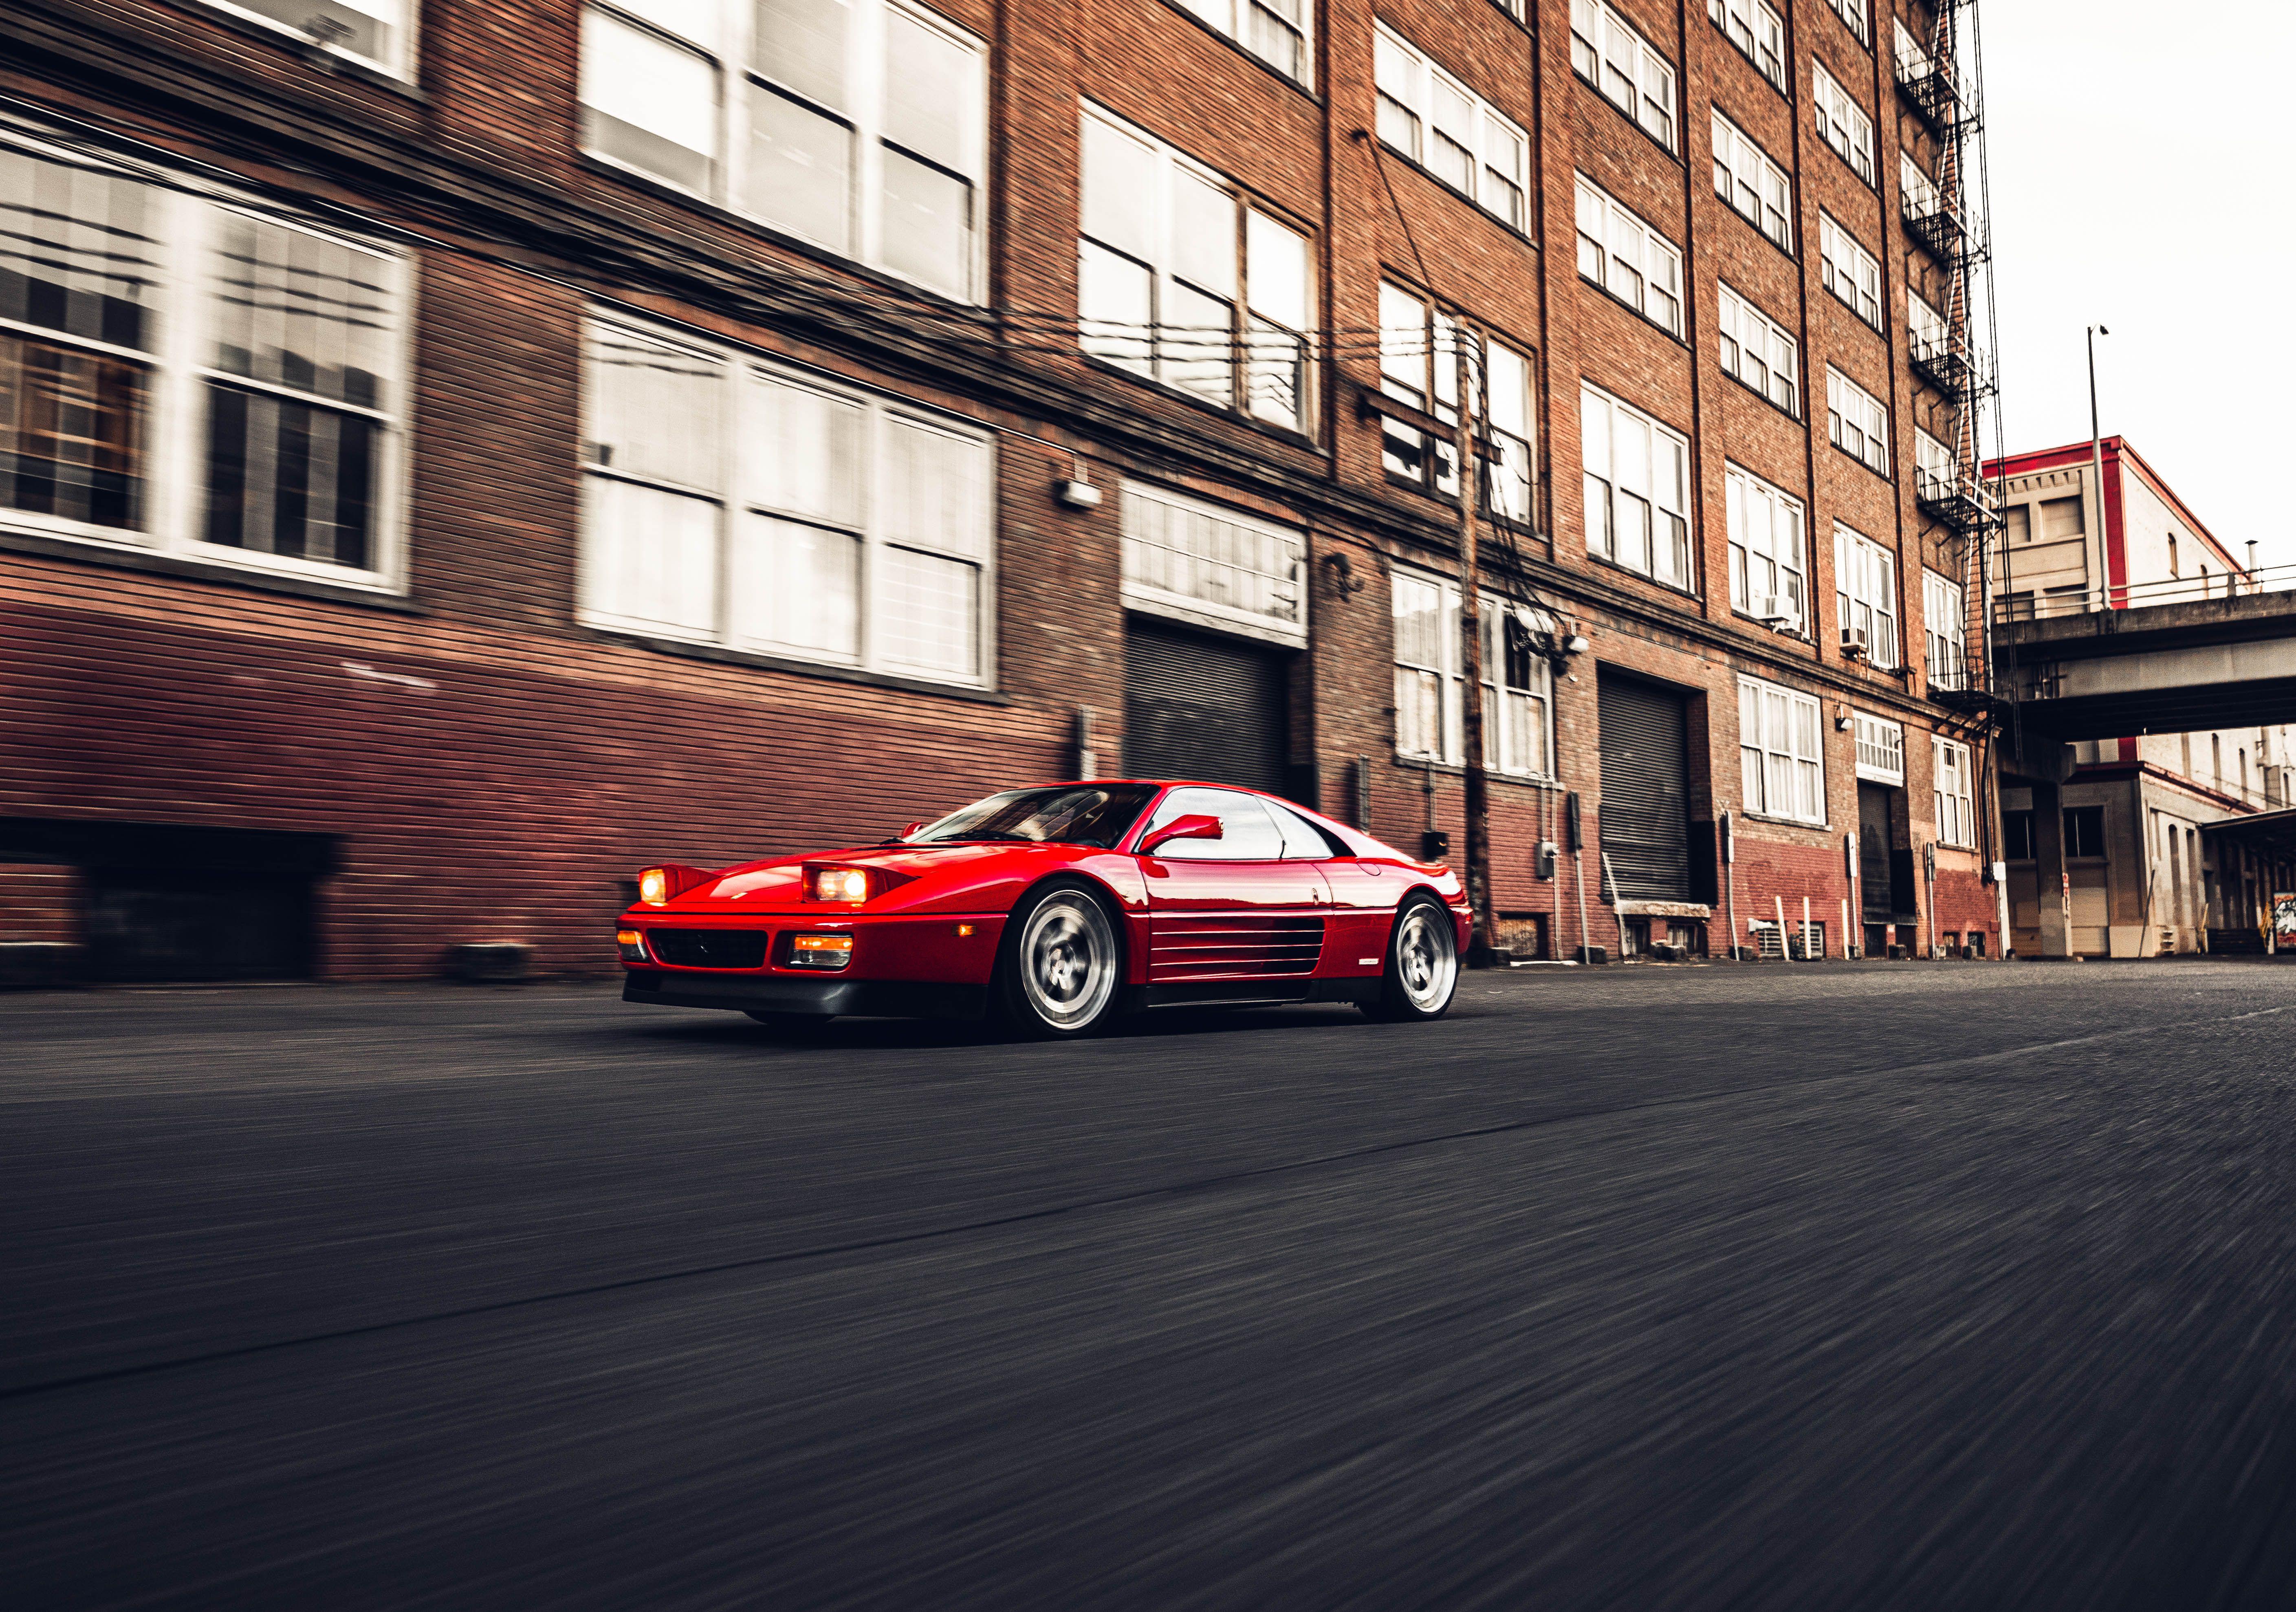 Ferrari 348 4k Ferrari 348 4k Wallpapers Ferrari 348 Ferrari 4k Wallpapers